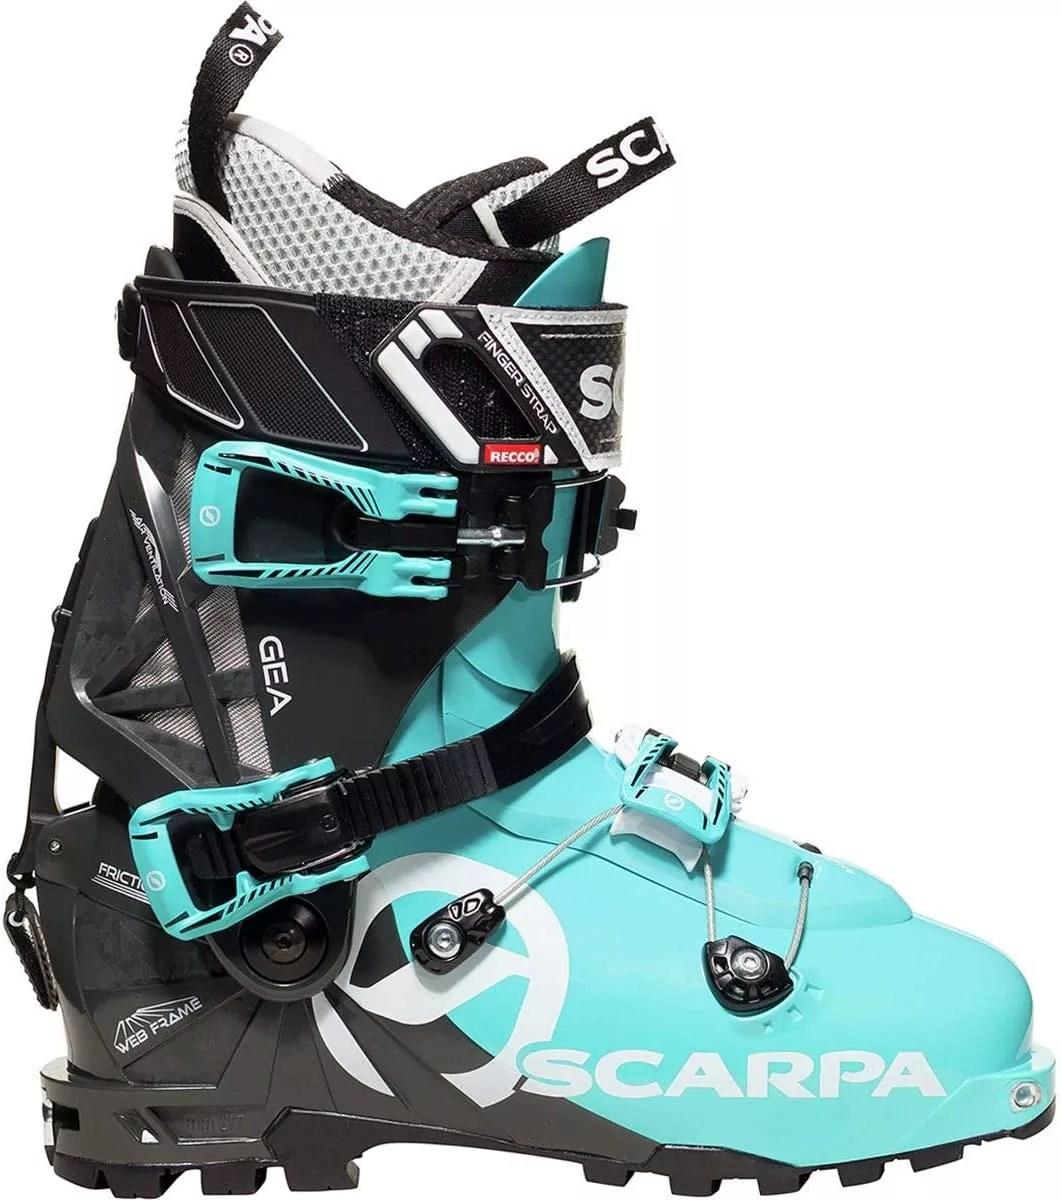 Scarpa GEA Alpine Touring Ski Boots – Women